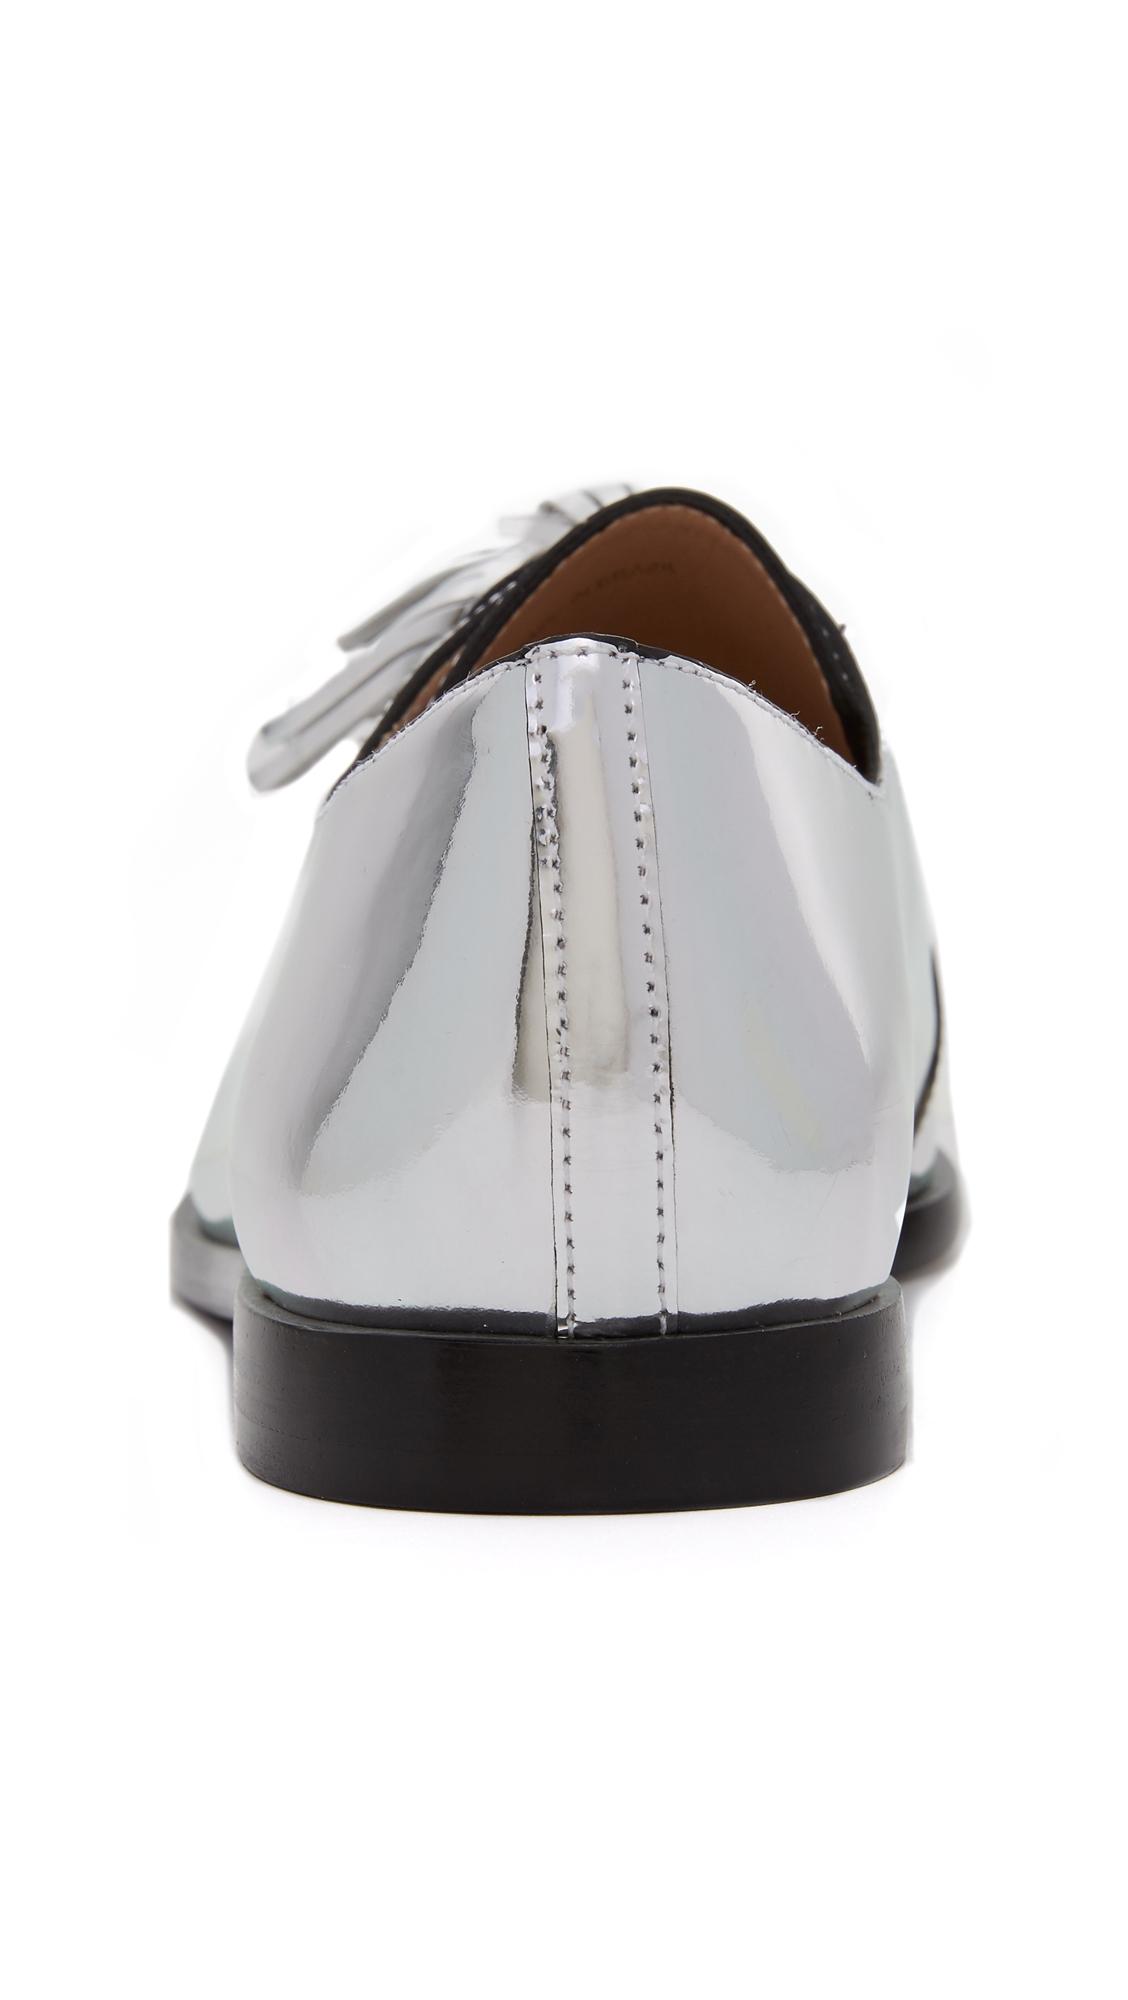 Ботинки на шнурках Jasper с кисточками Loeffler Randall  (LOEFF4080412208162)